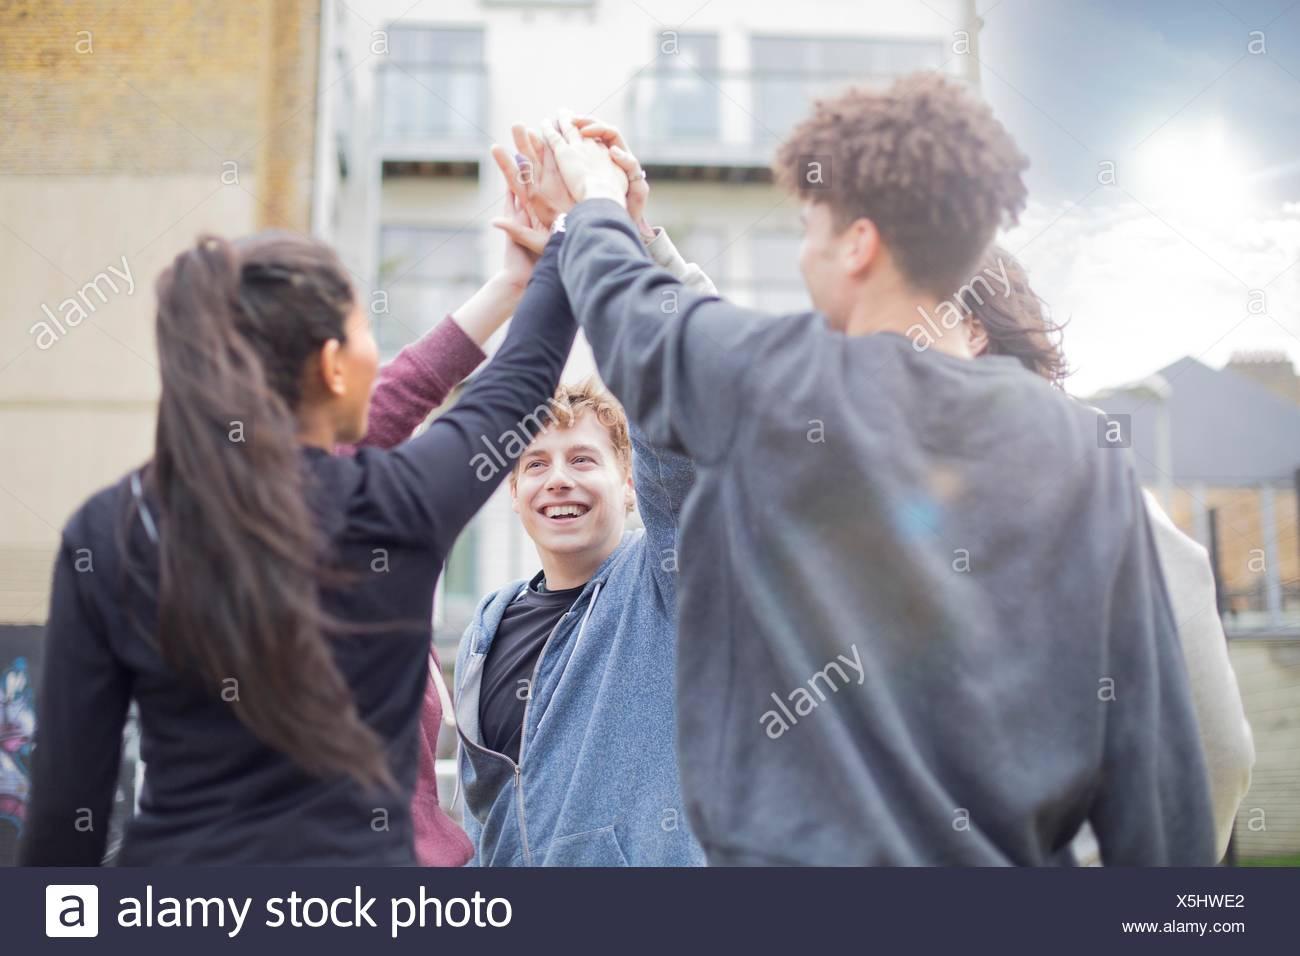 Grupo de adultos, tocando las manos al aire libre Imagen De Stock